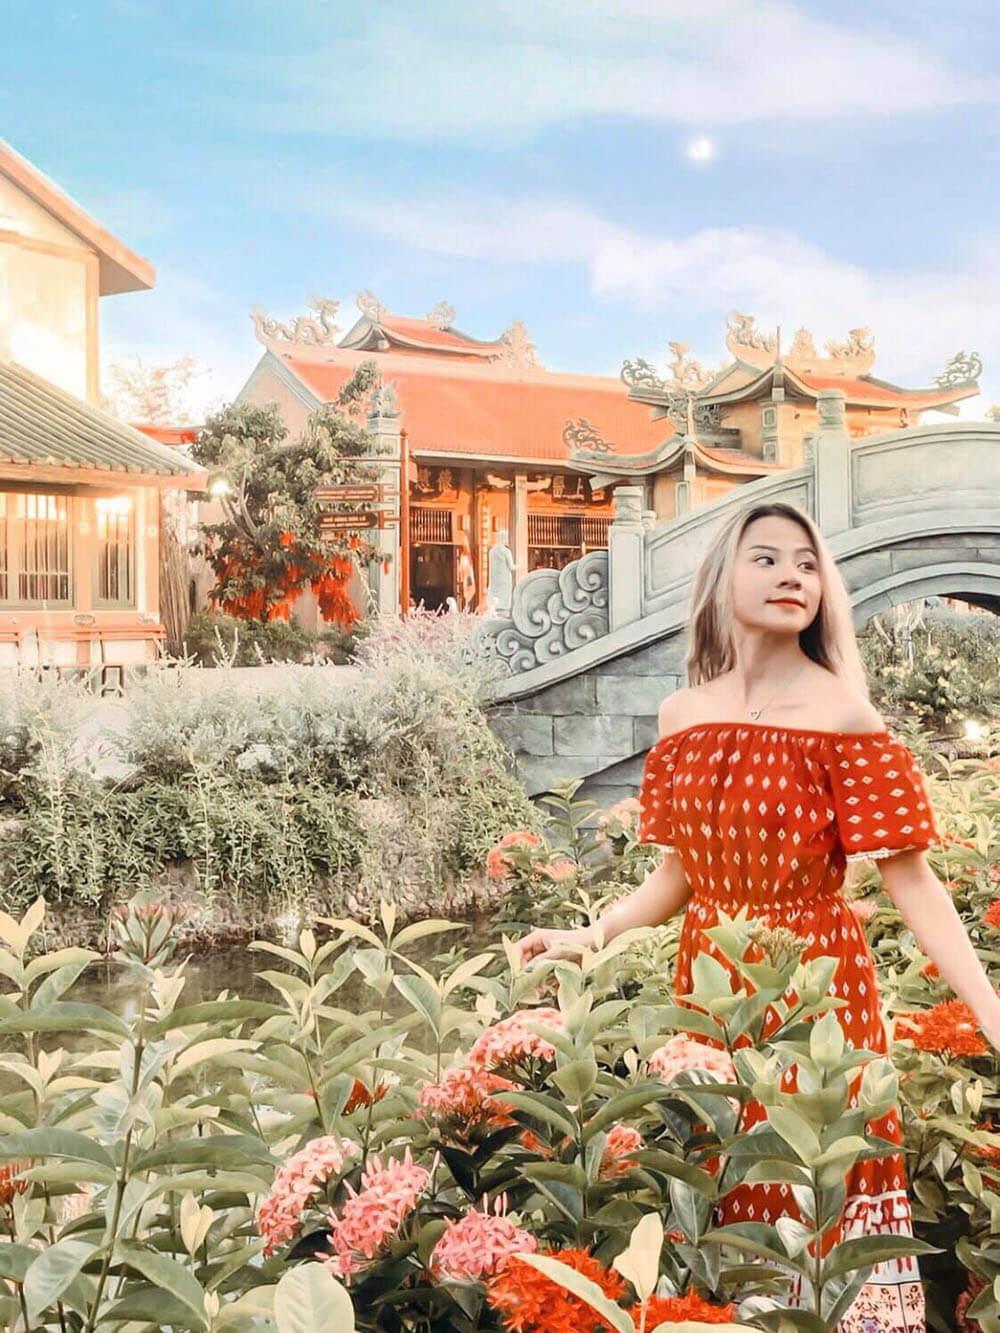 Cong Vien An Tuong Hoi An Show Dien Ky Uc Hoi An Review Kinh Nghiem Kham Pha Hoi An Chi Trong 1 Ngay Danang Fantasticity Com 01